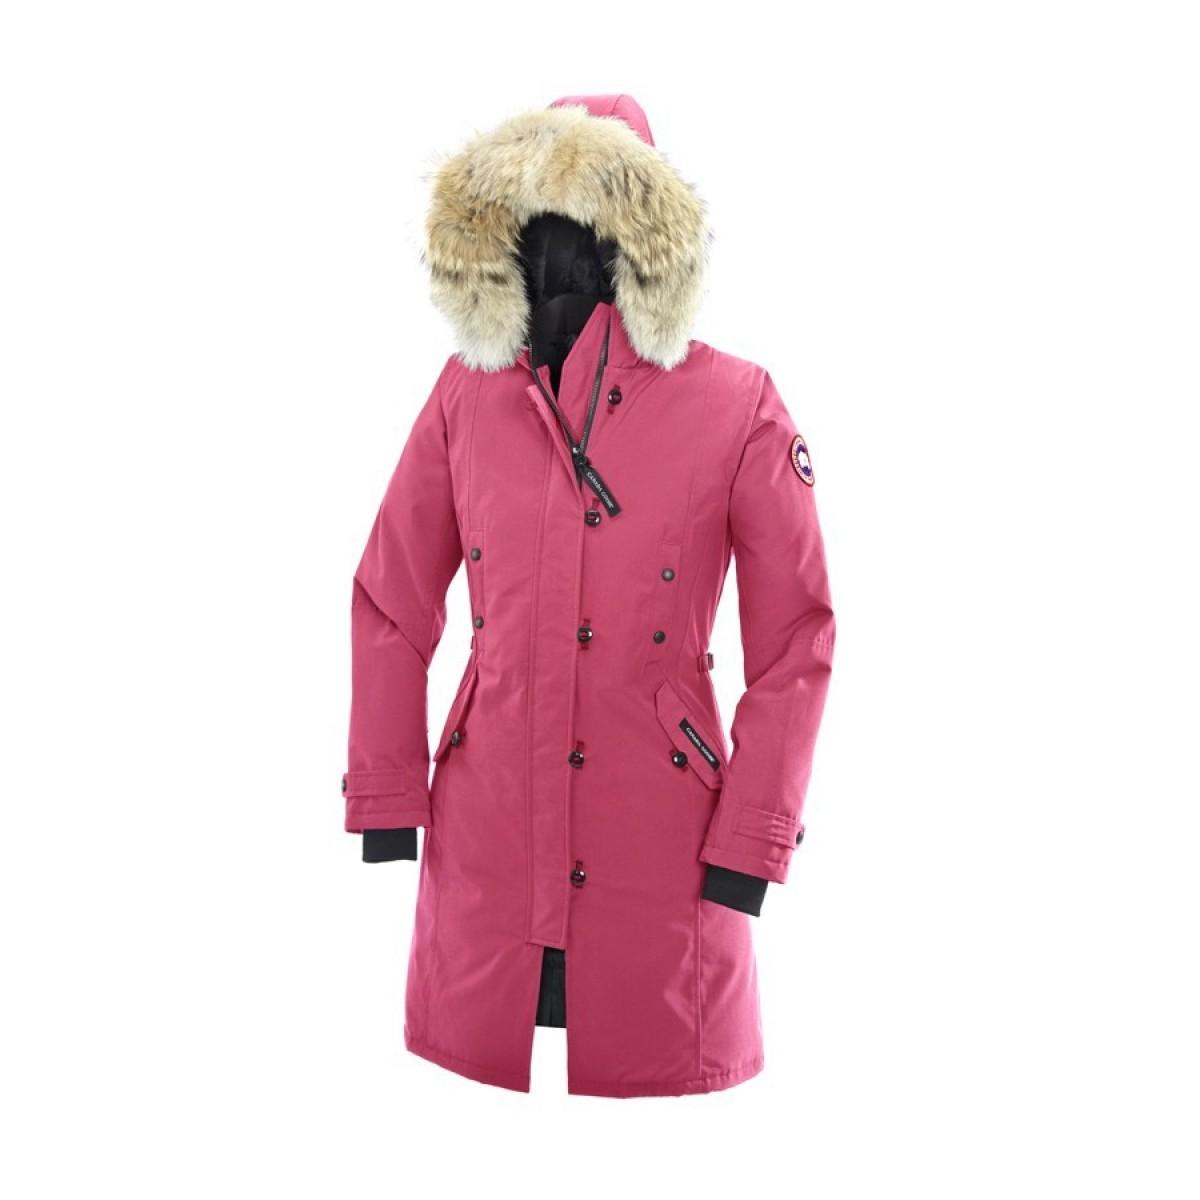 Canada Goose Kensington Parka Summit Pink Femme en Solde